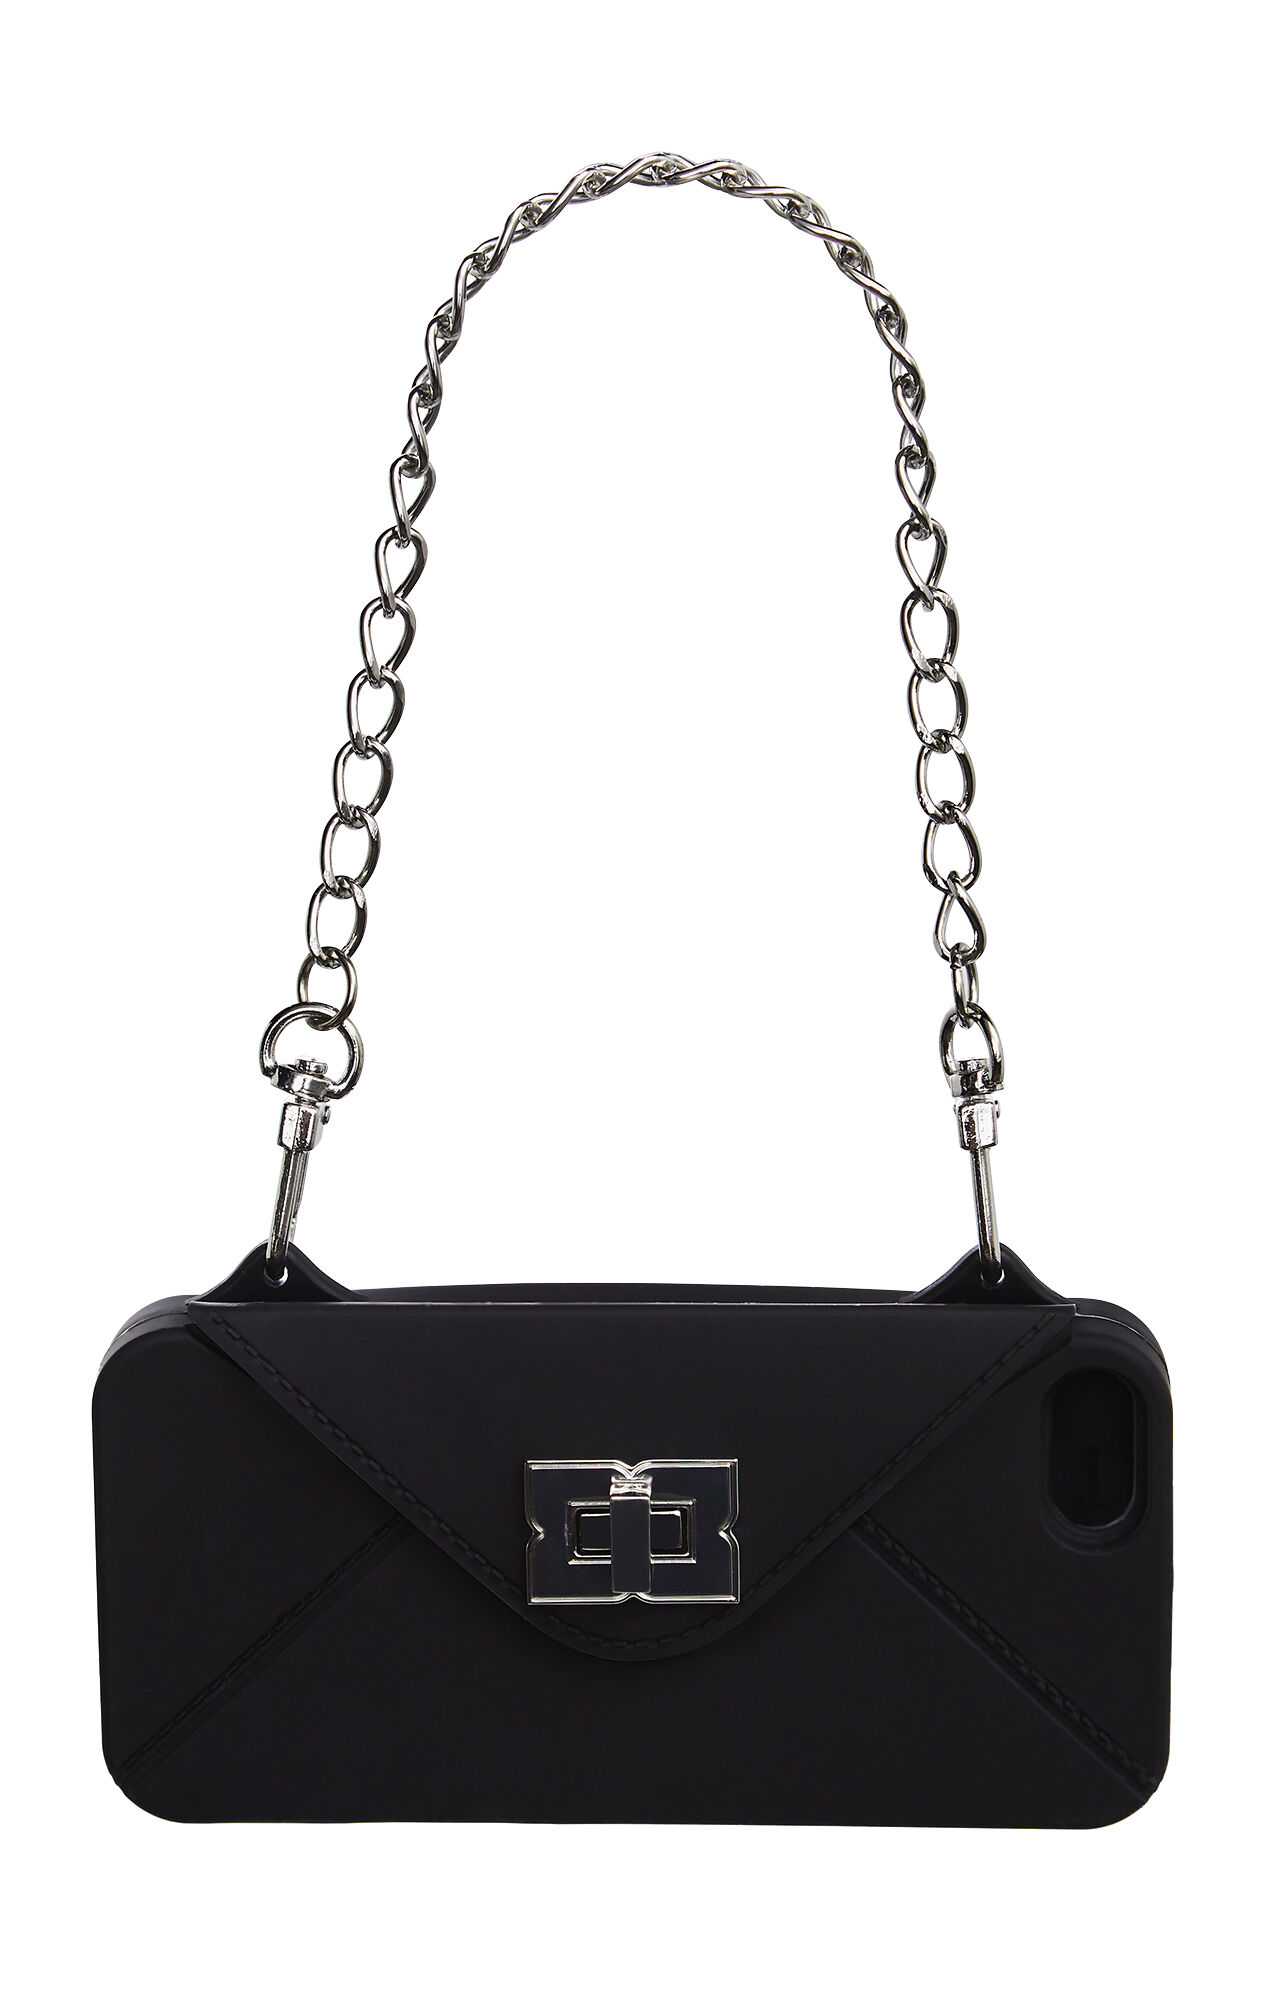 iPhone 5 Turn-Lock Handbag Case